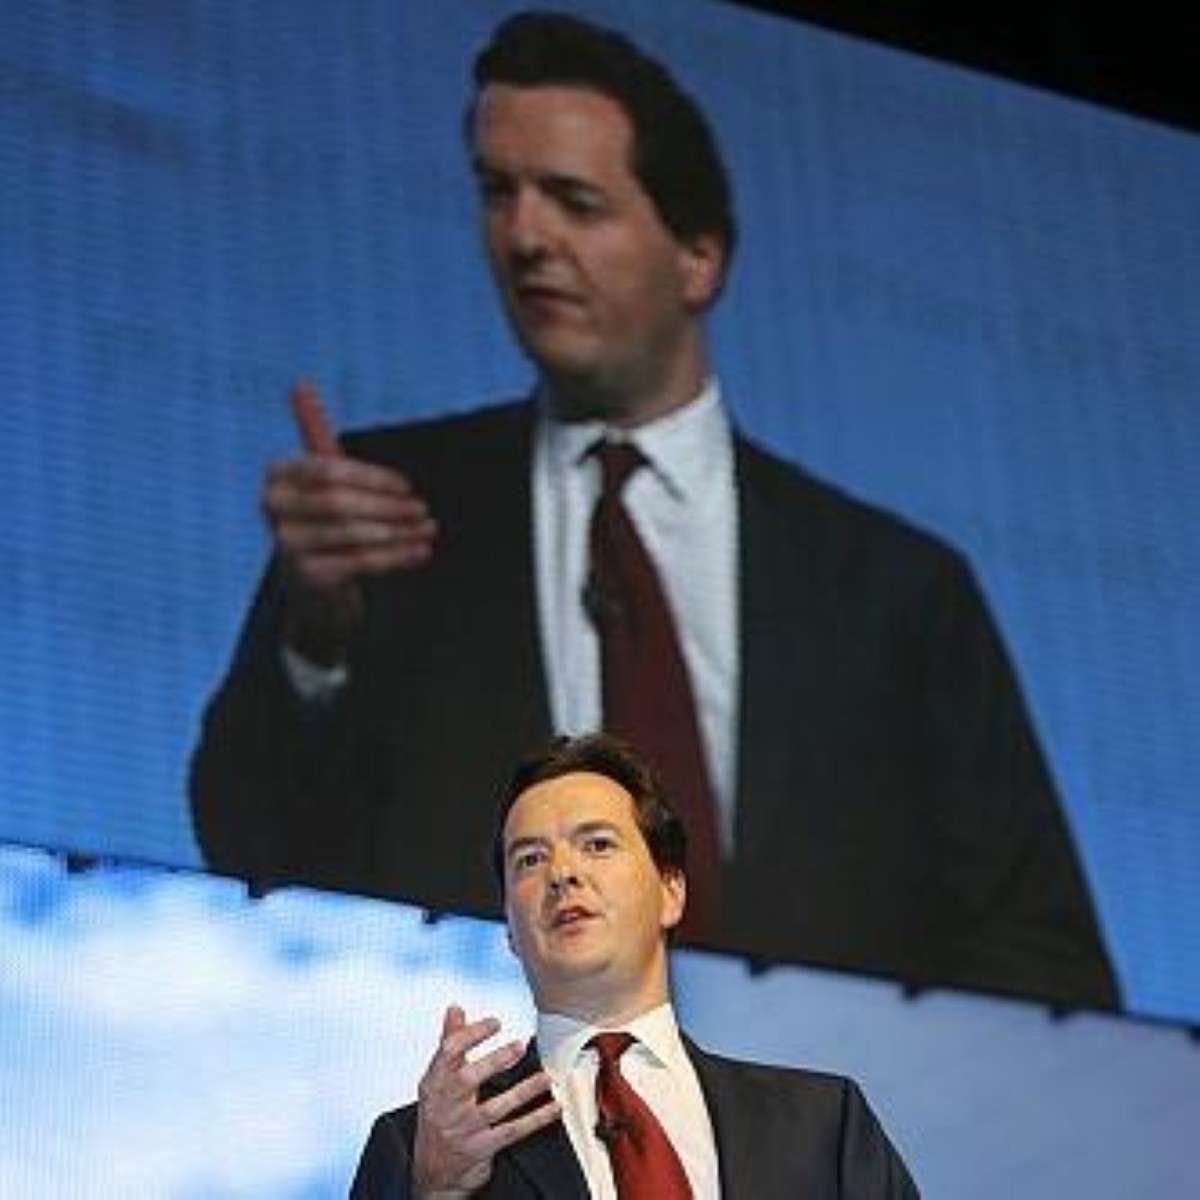 Osborne rejects 'anti-business' mood